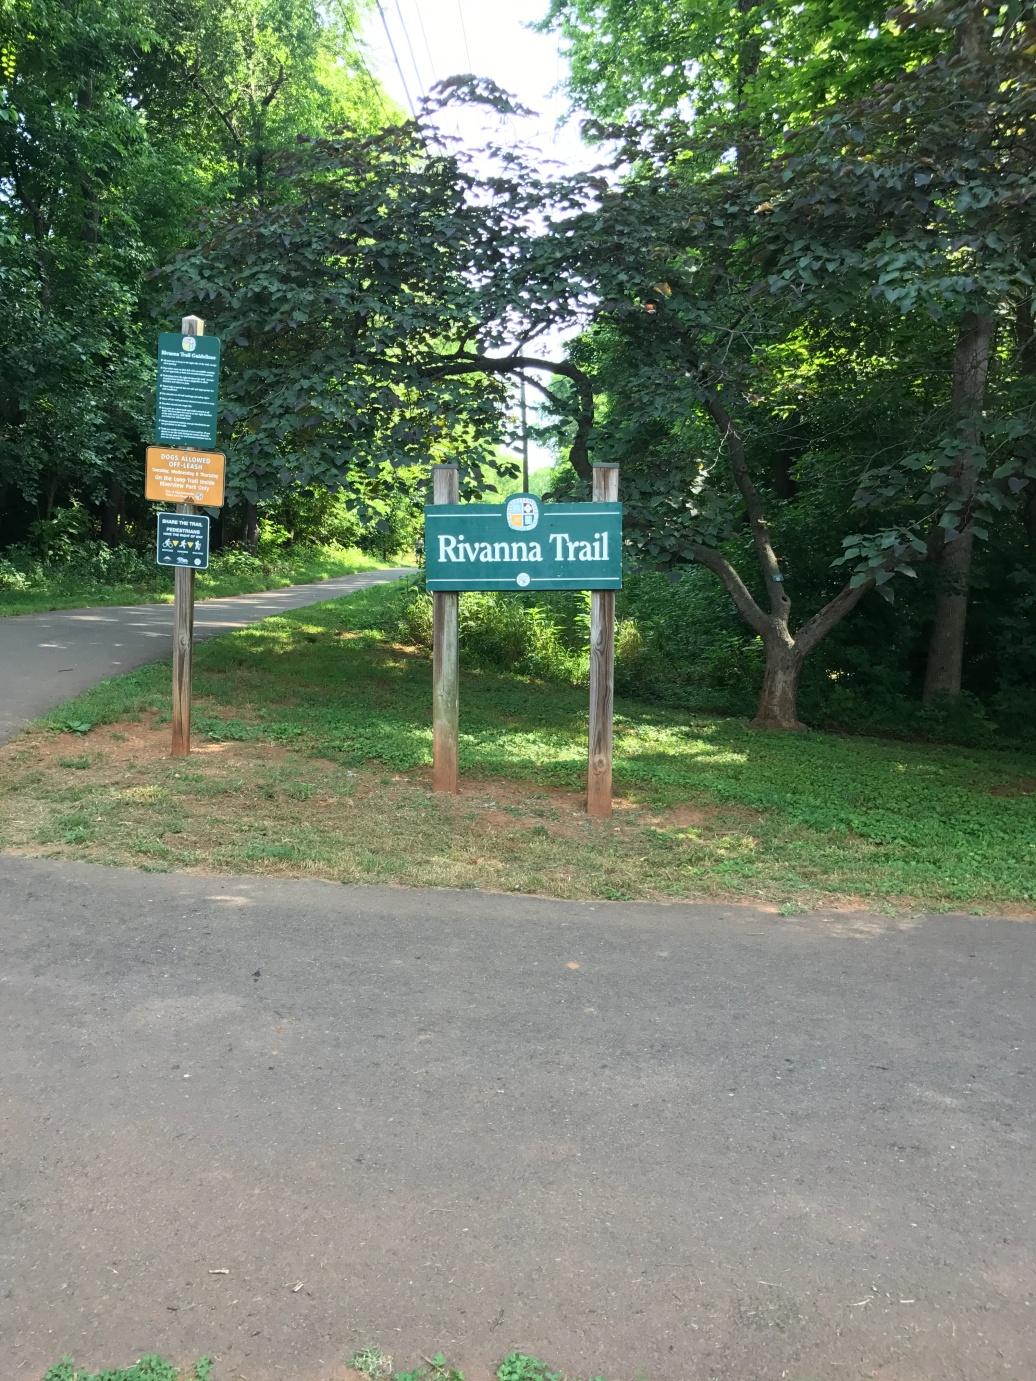 Rihanna River Trail access from the neighborhood park